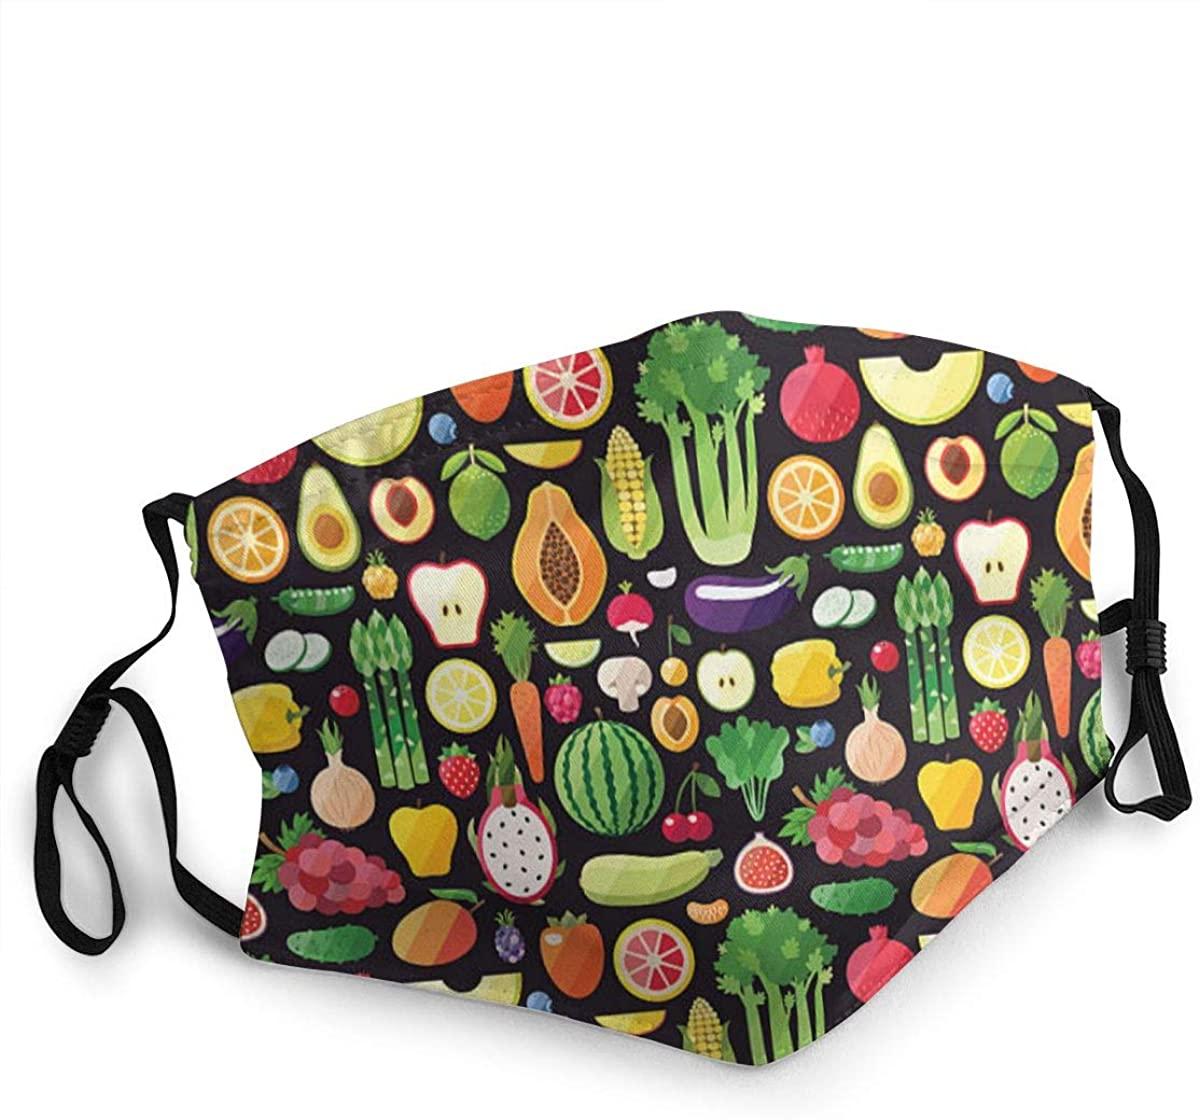 Fashion Protective Face Masks, Big Fruits and Vegetables Unisex Dust Mouth Masks, Washable, Reusable Masks